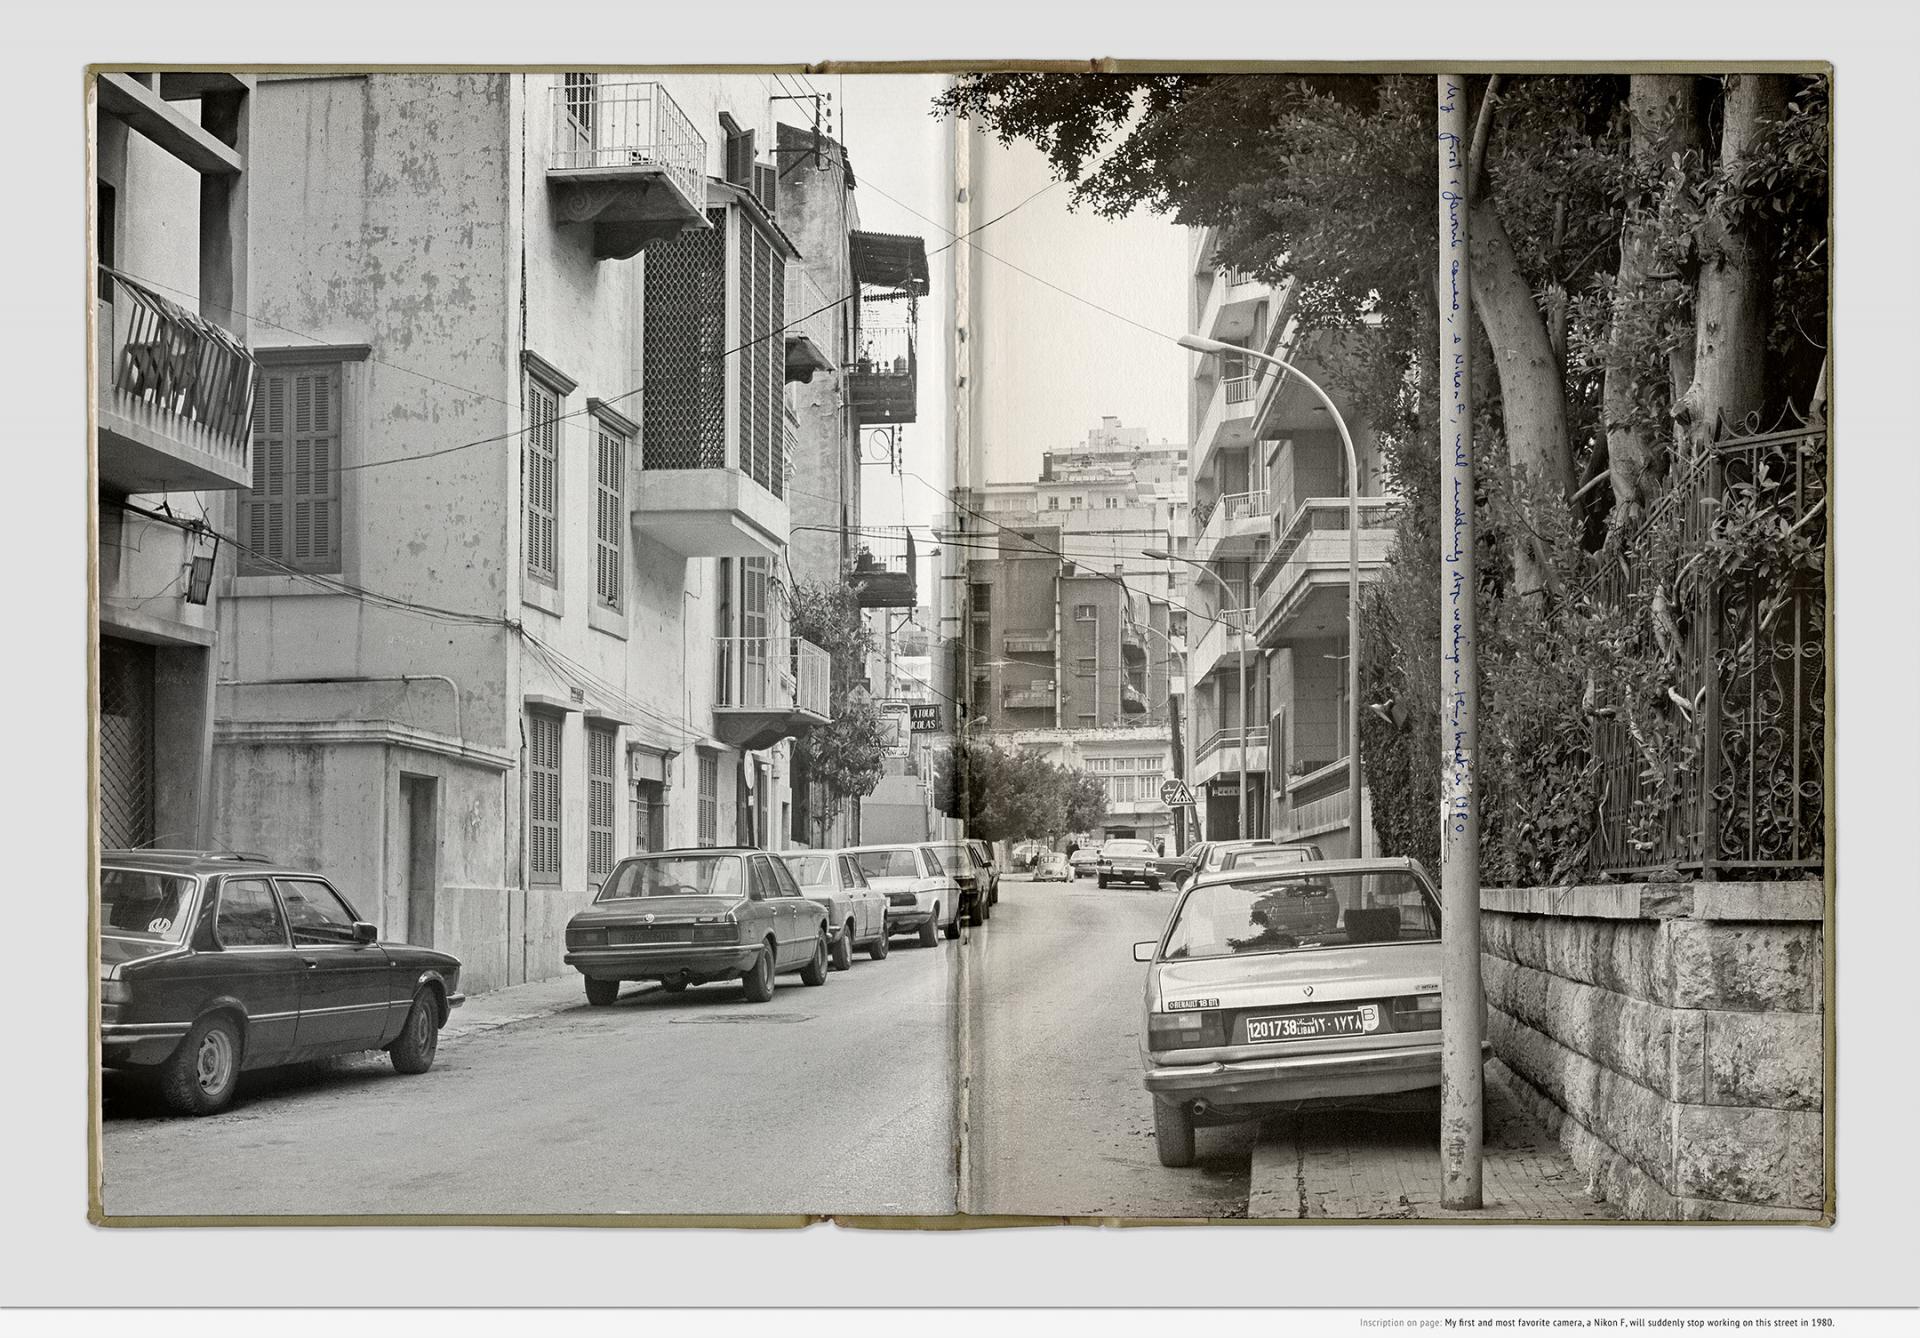 Sweet Talk. Commissions (Beirut) _ 1987.006, 1987-2019, inkjet print, 54.3 x 76.3 x 3.5cm, framed